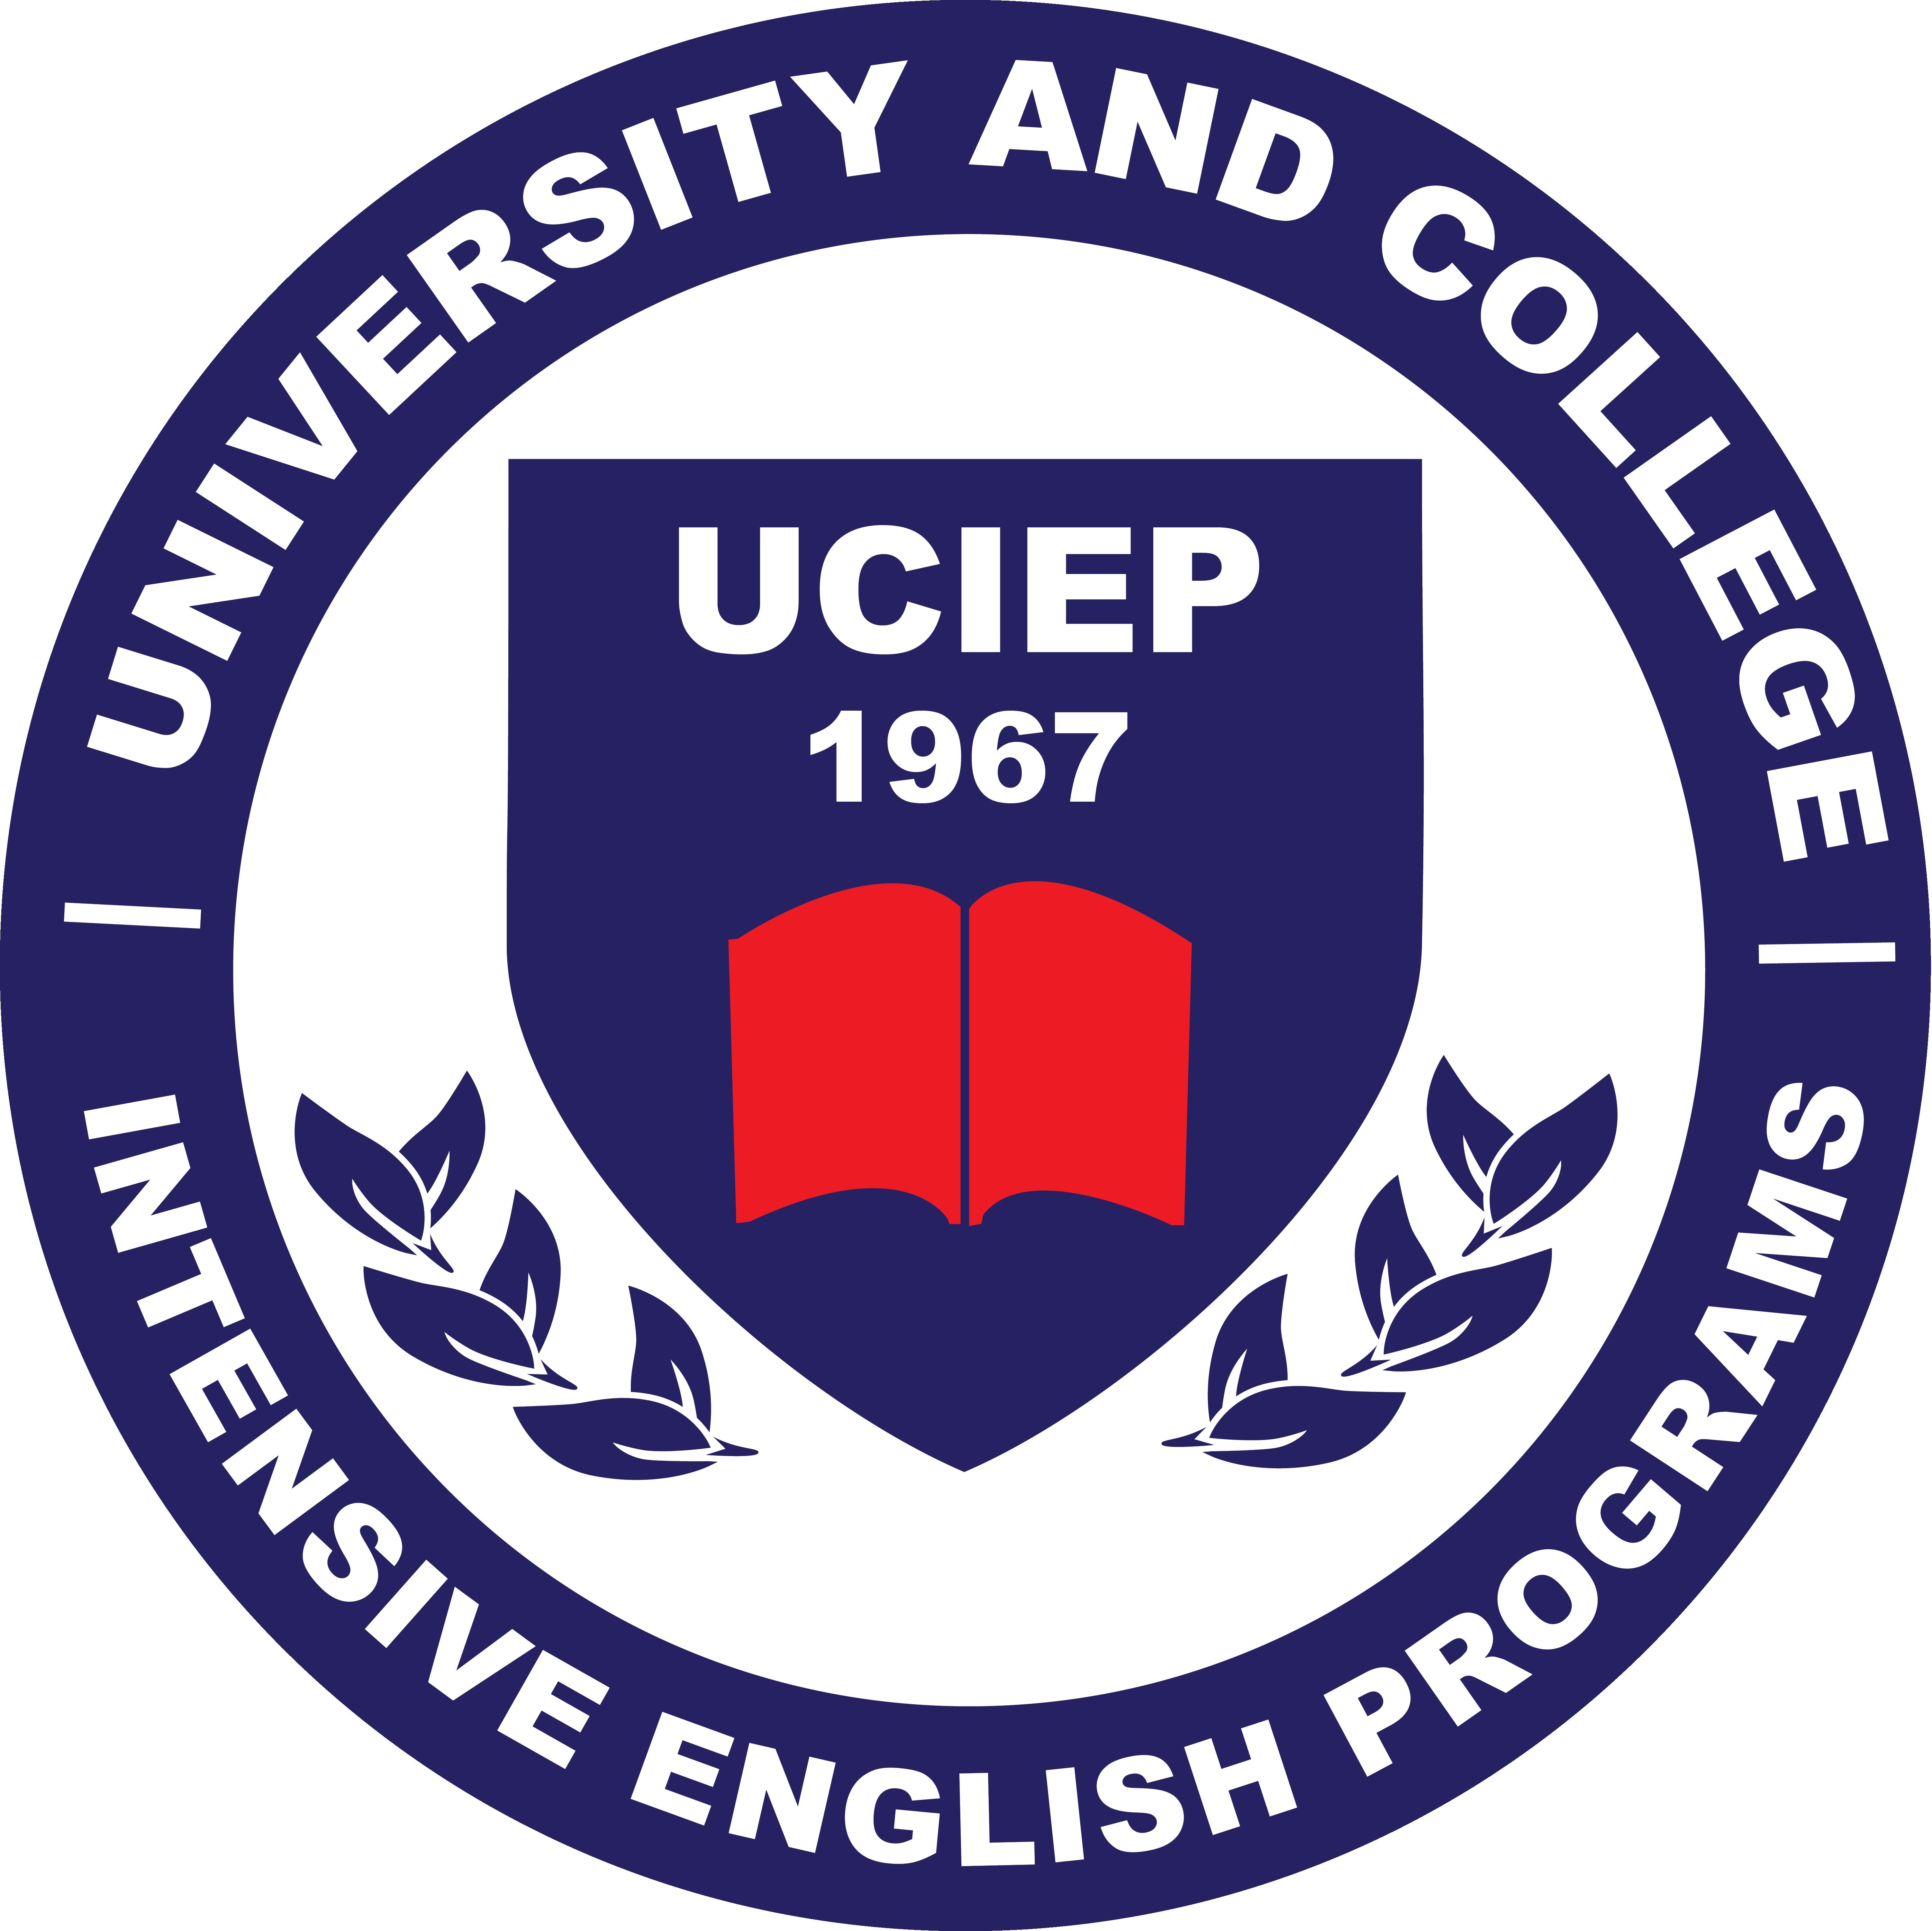 University and College Intensive English Program